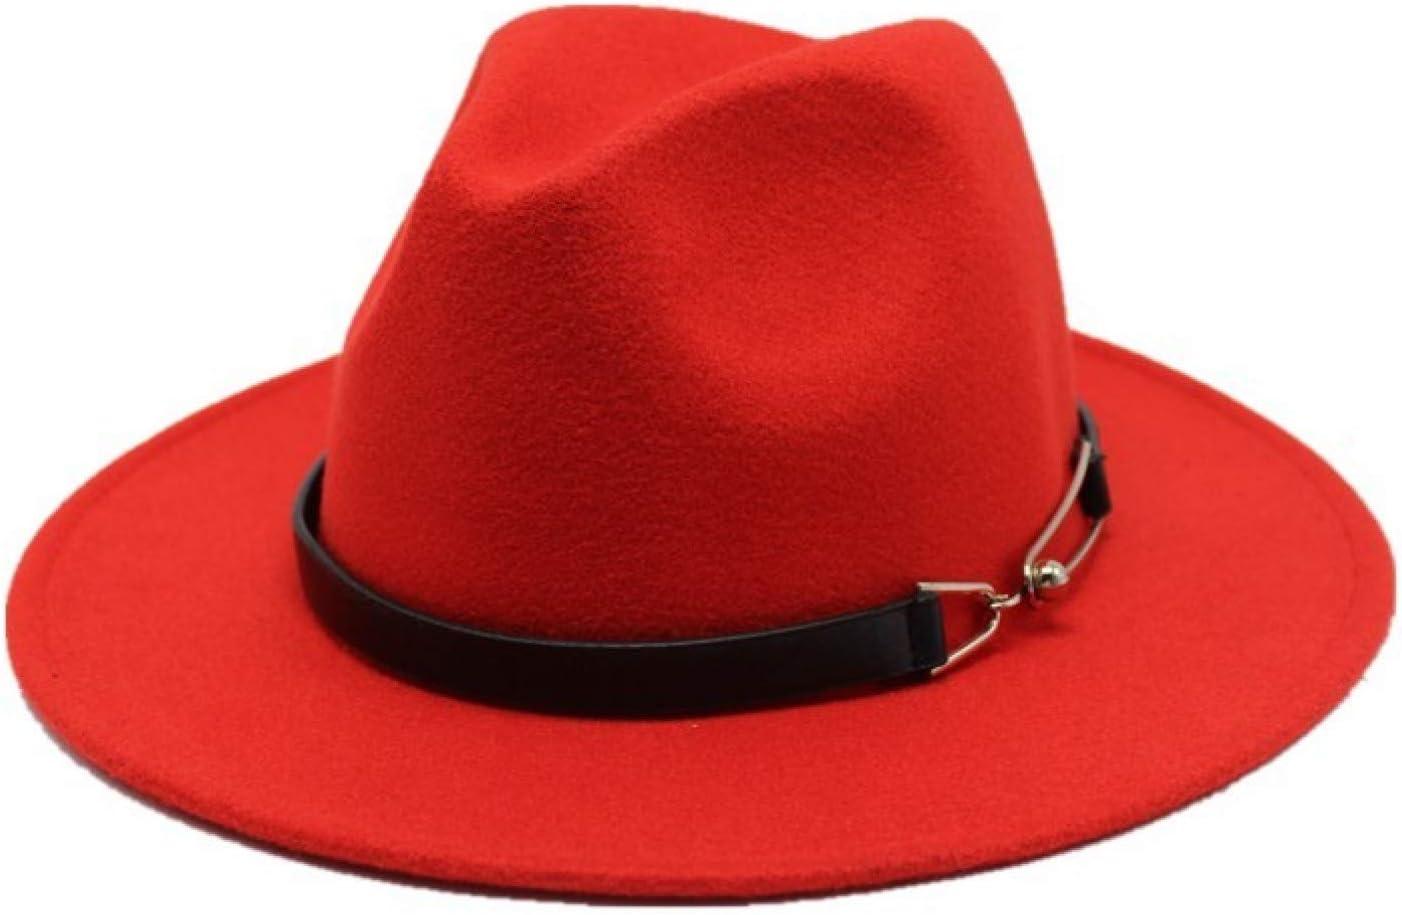 BAJIE Fedora Autumn Women'S Fashion Top Hat, Jazz Hat, Winter Fedora Hat, Wool Hat, New Black Female Hat